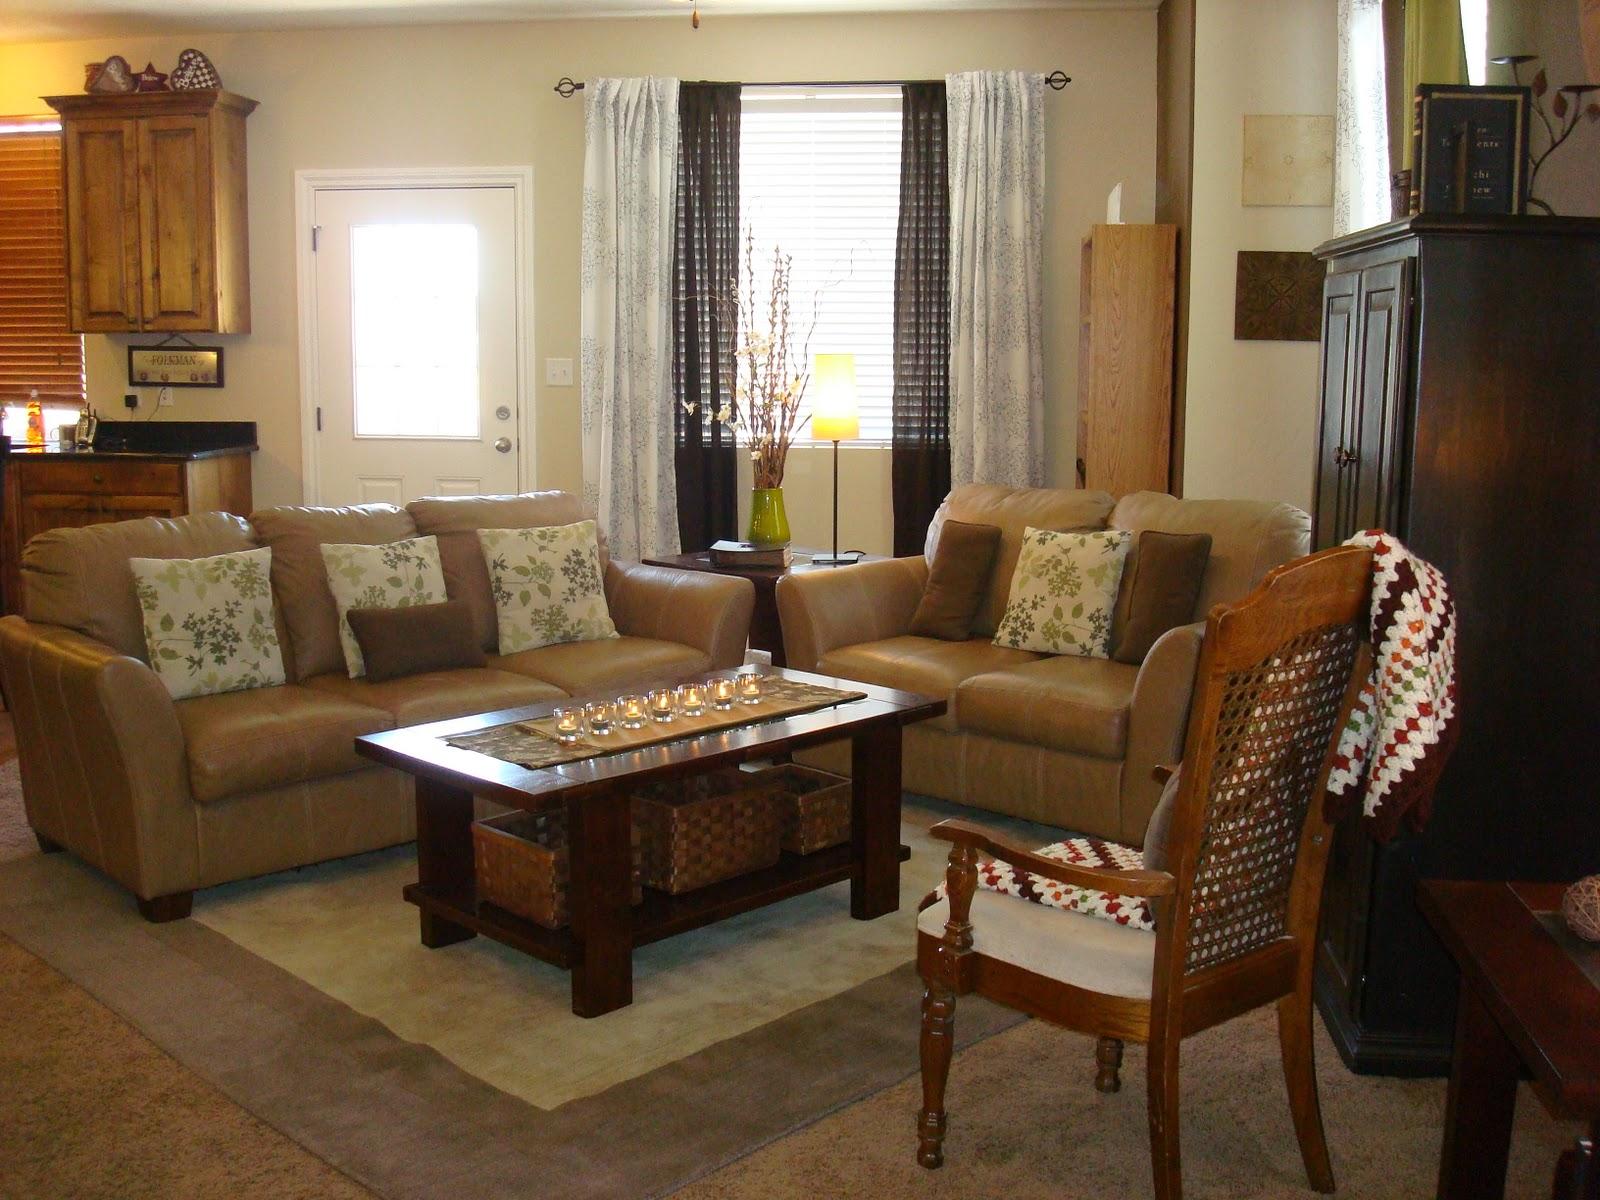 ImagineCozy: Living Room Redo